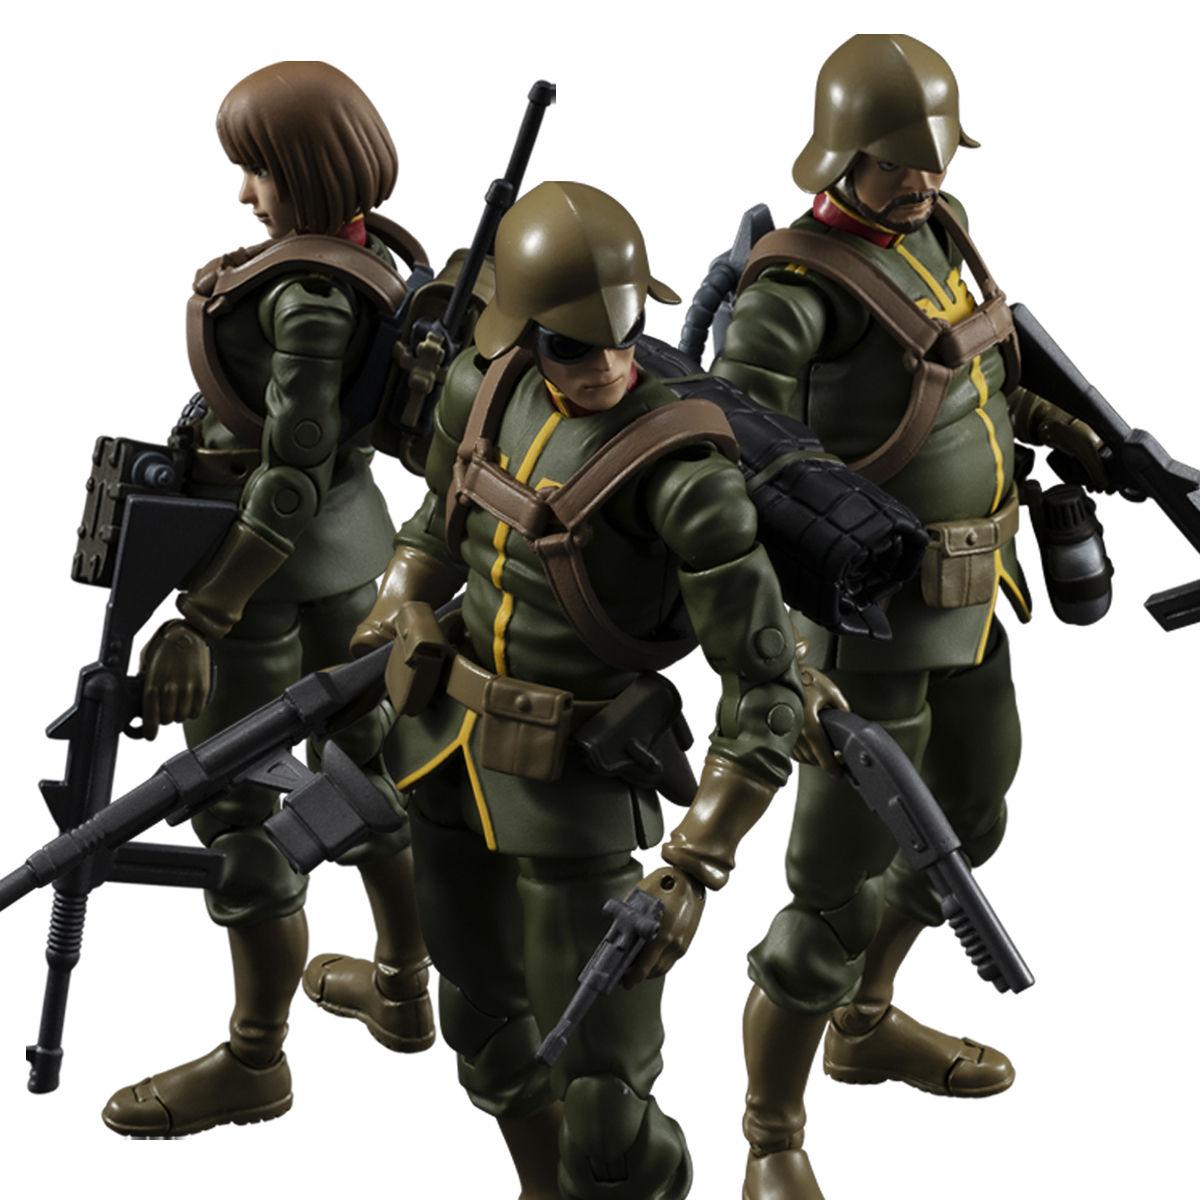 G.M.G. ガンダムミリタリージェネレーション『ジオン公国軍一般兵士01』1/18 可動フィギュア-001